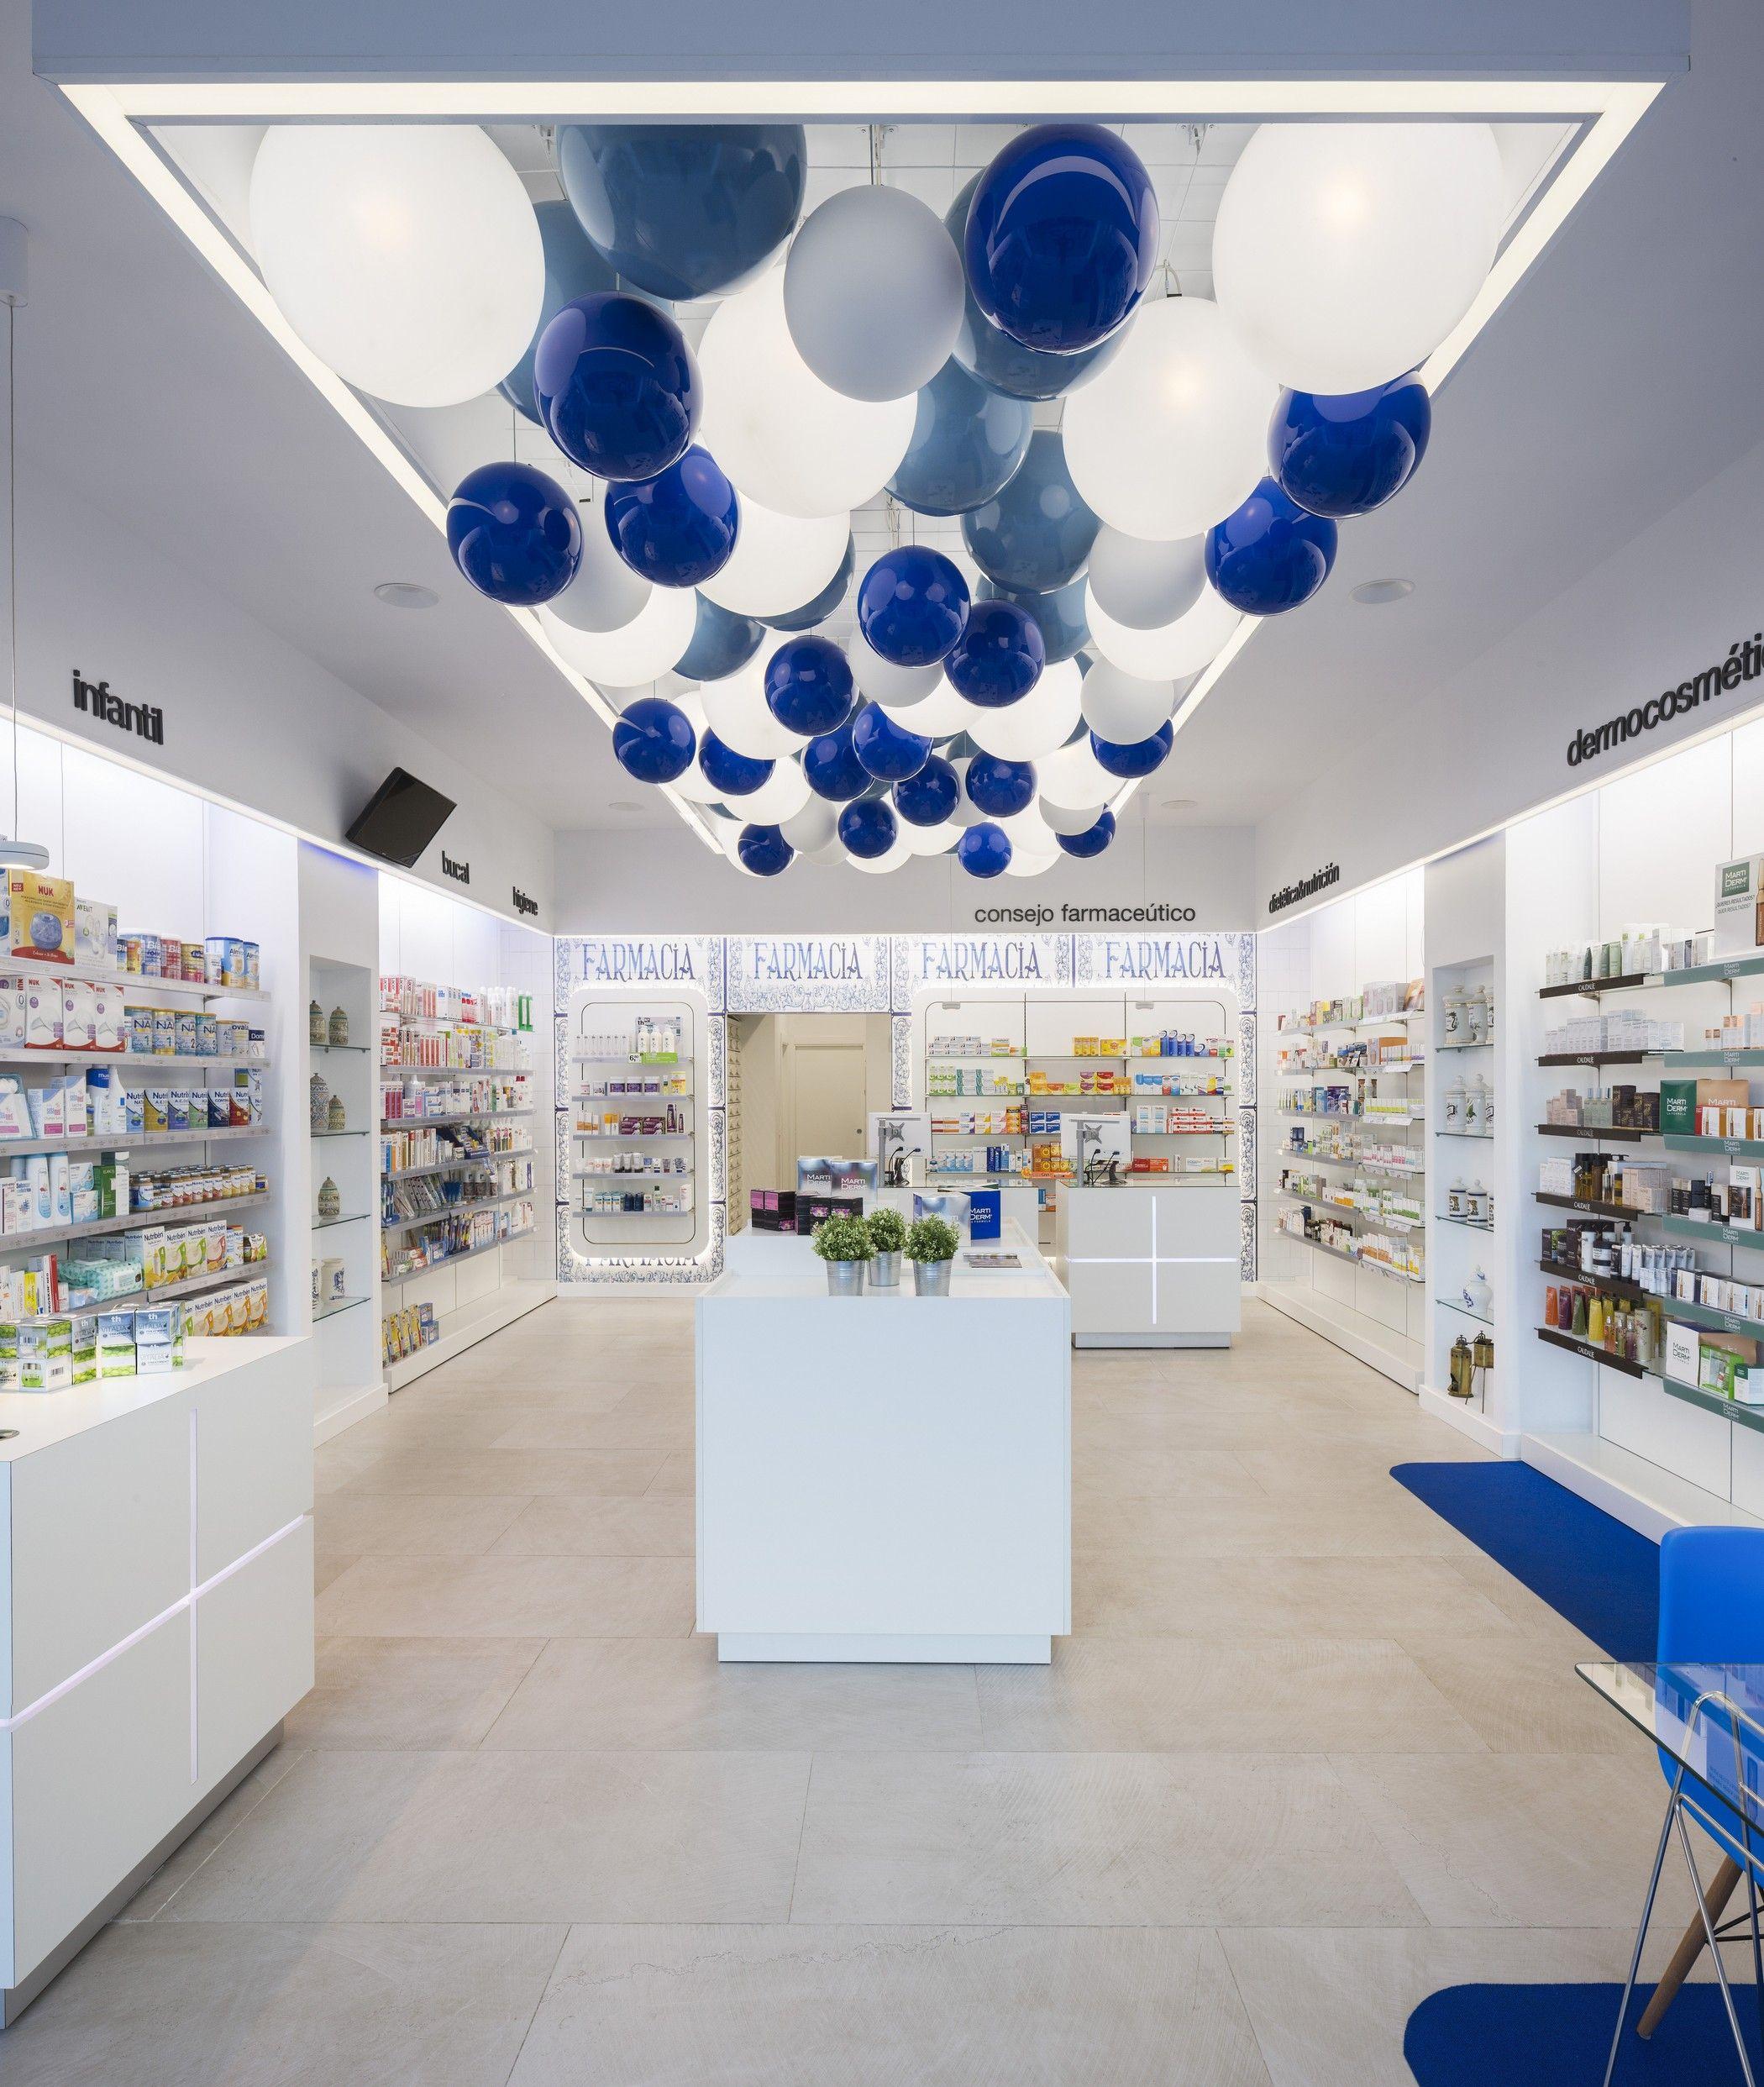 ecu student health pharmacy